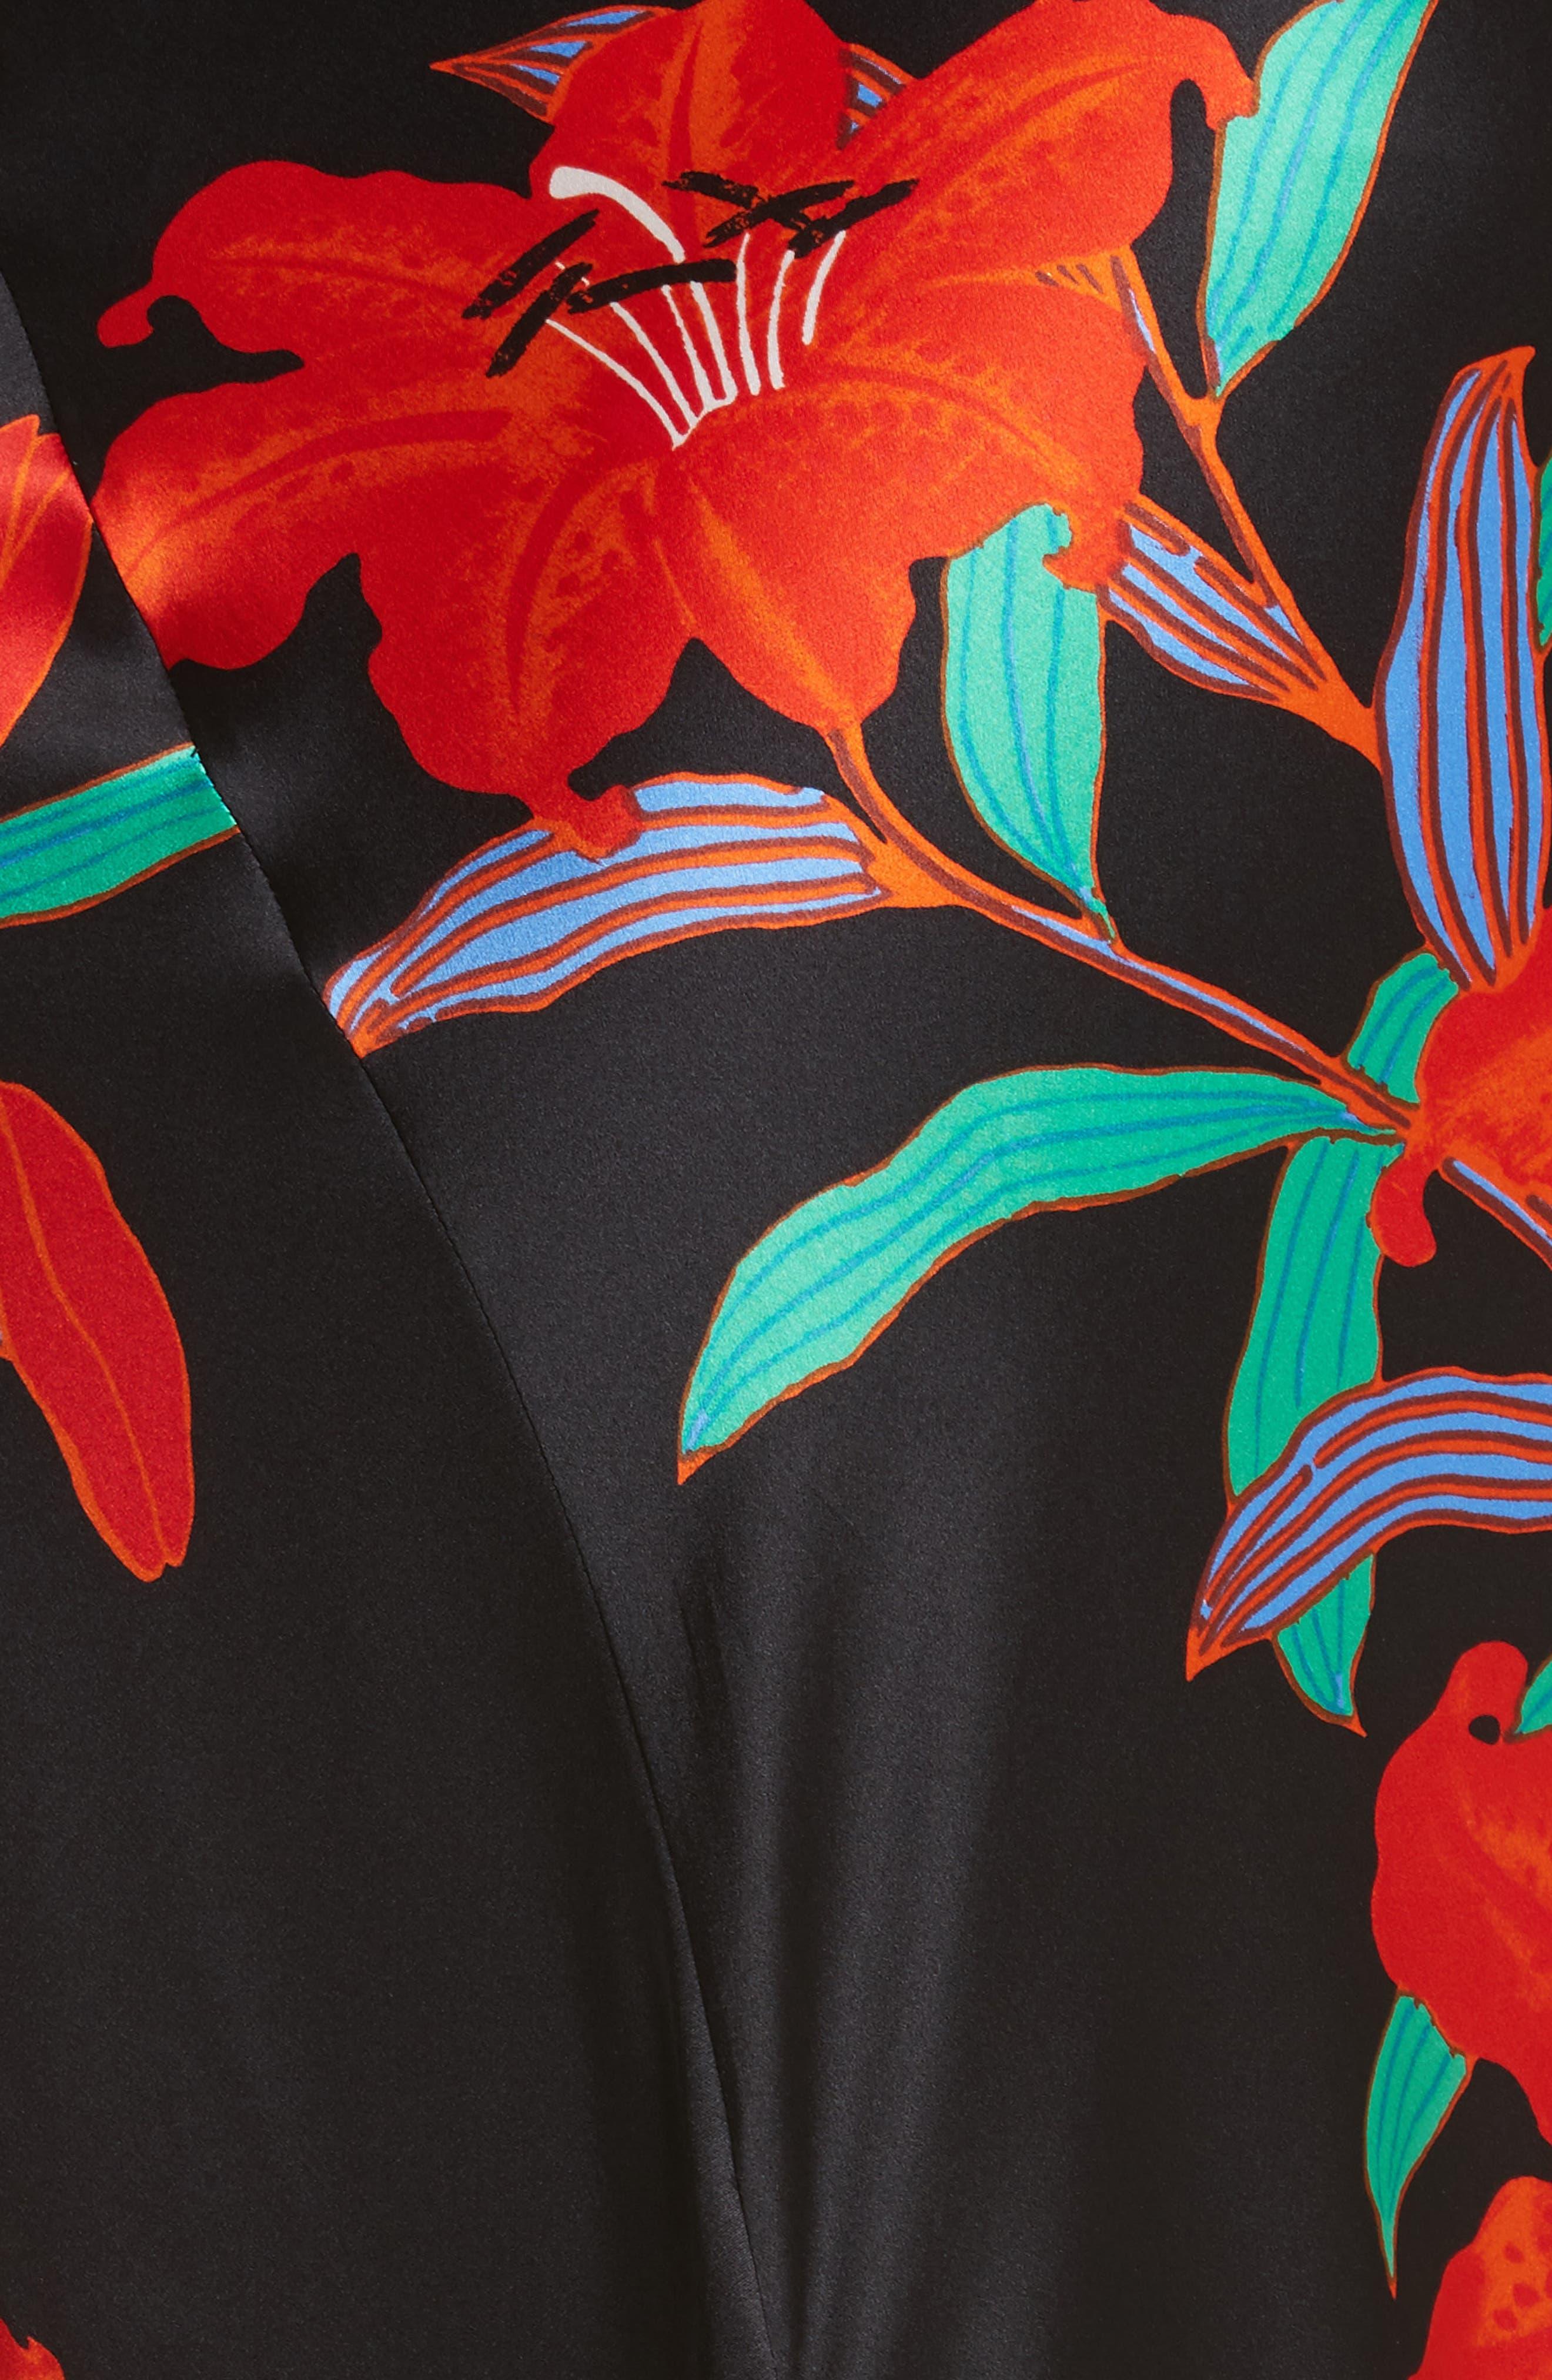 Diane von Furstenberg Asymmetrical Knotted Gown,                             Alternate thumbnail 5, color,                             001